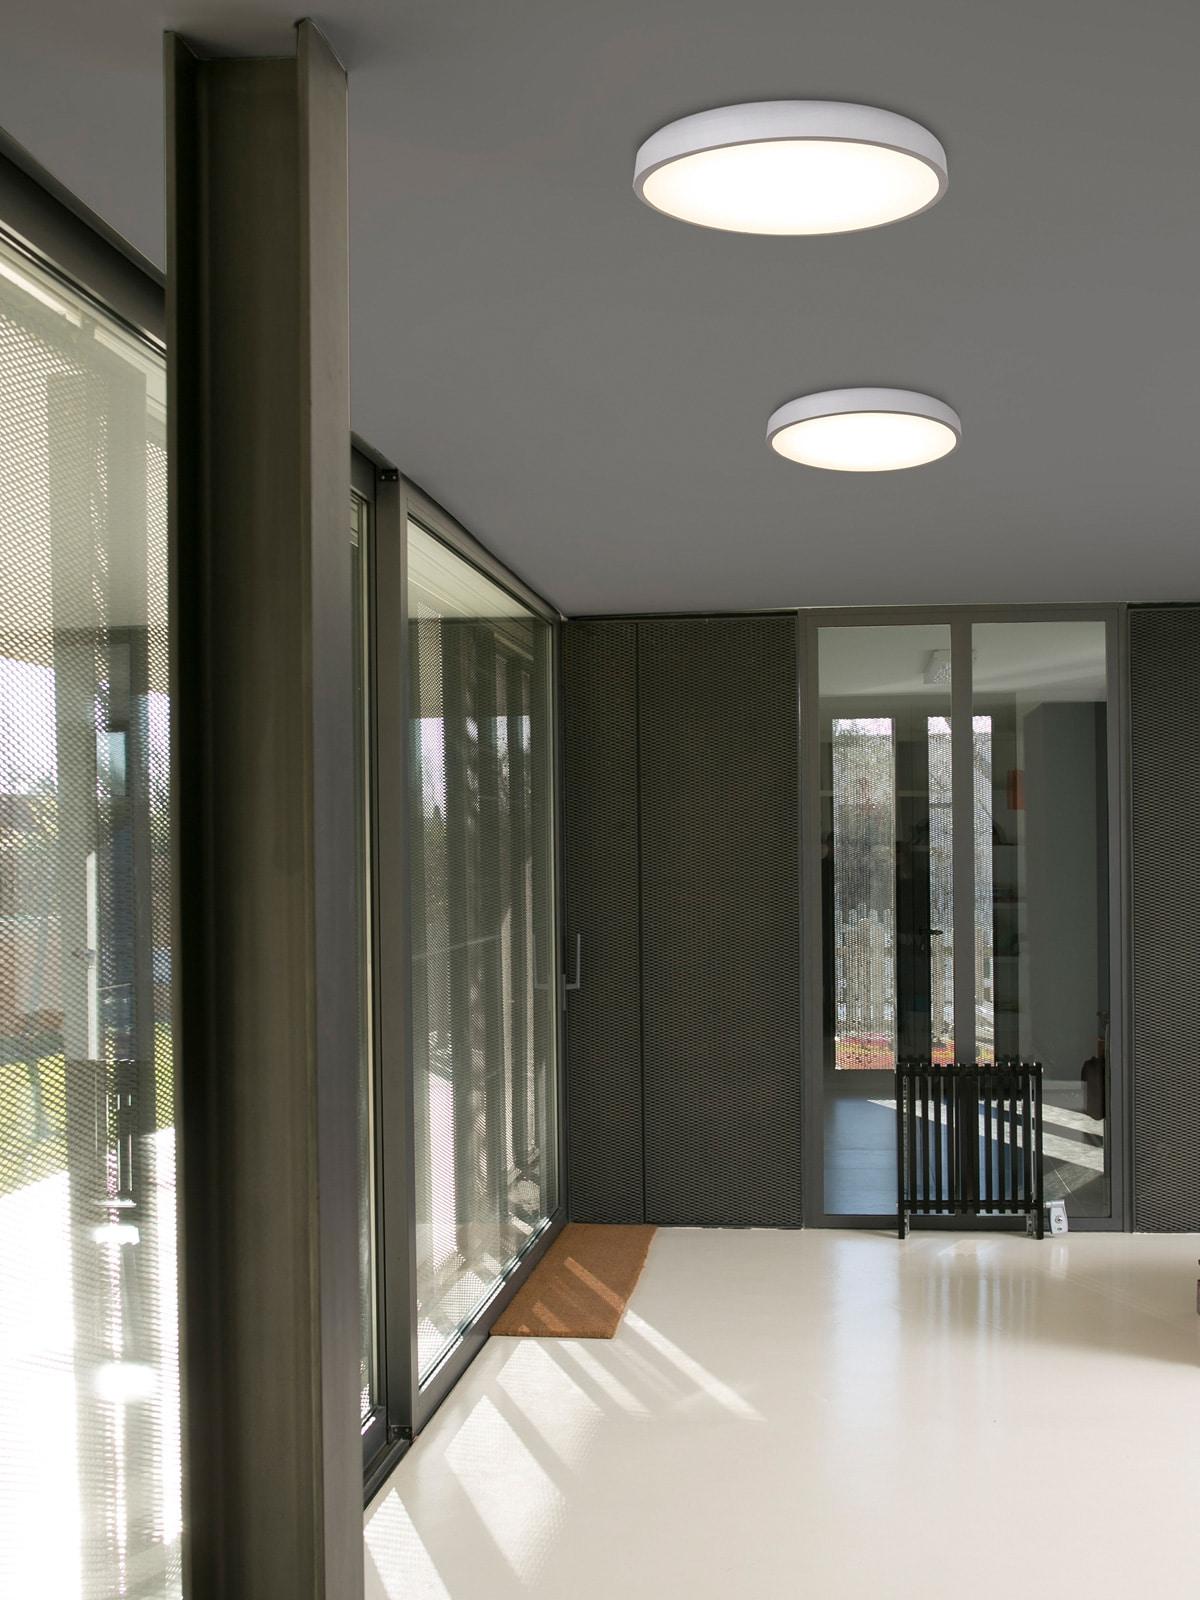 cocotte l ceiling led deckenleuchte lampen leuchten designerleuchten online berlin design. Black Bedroom Furniture Sets. Home Design Ideas